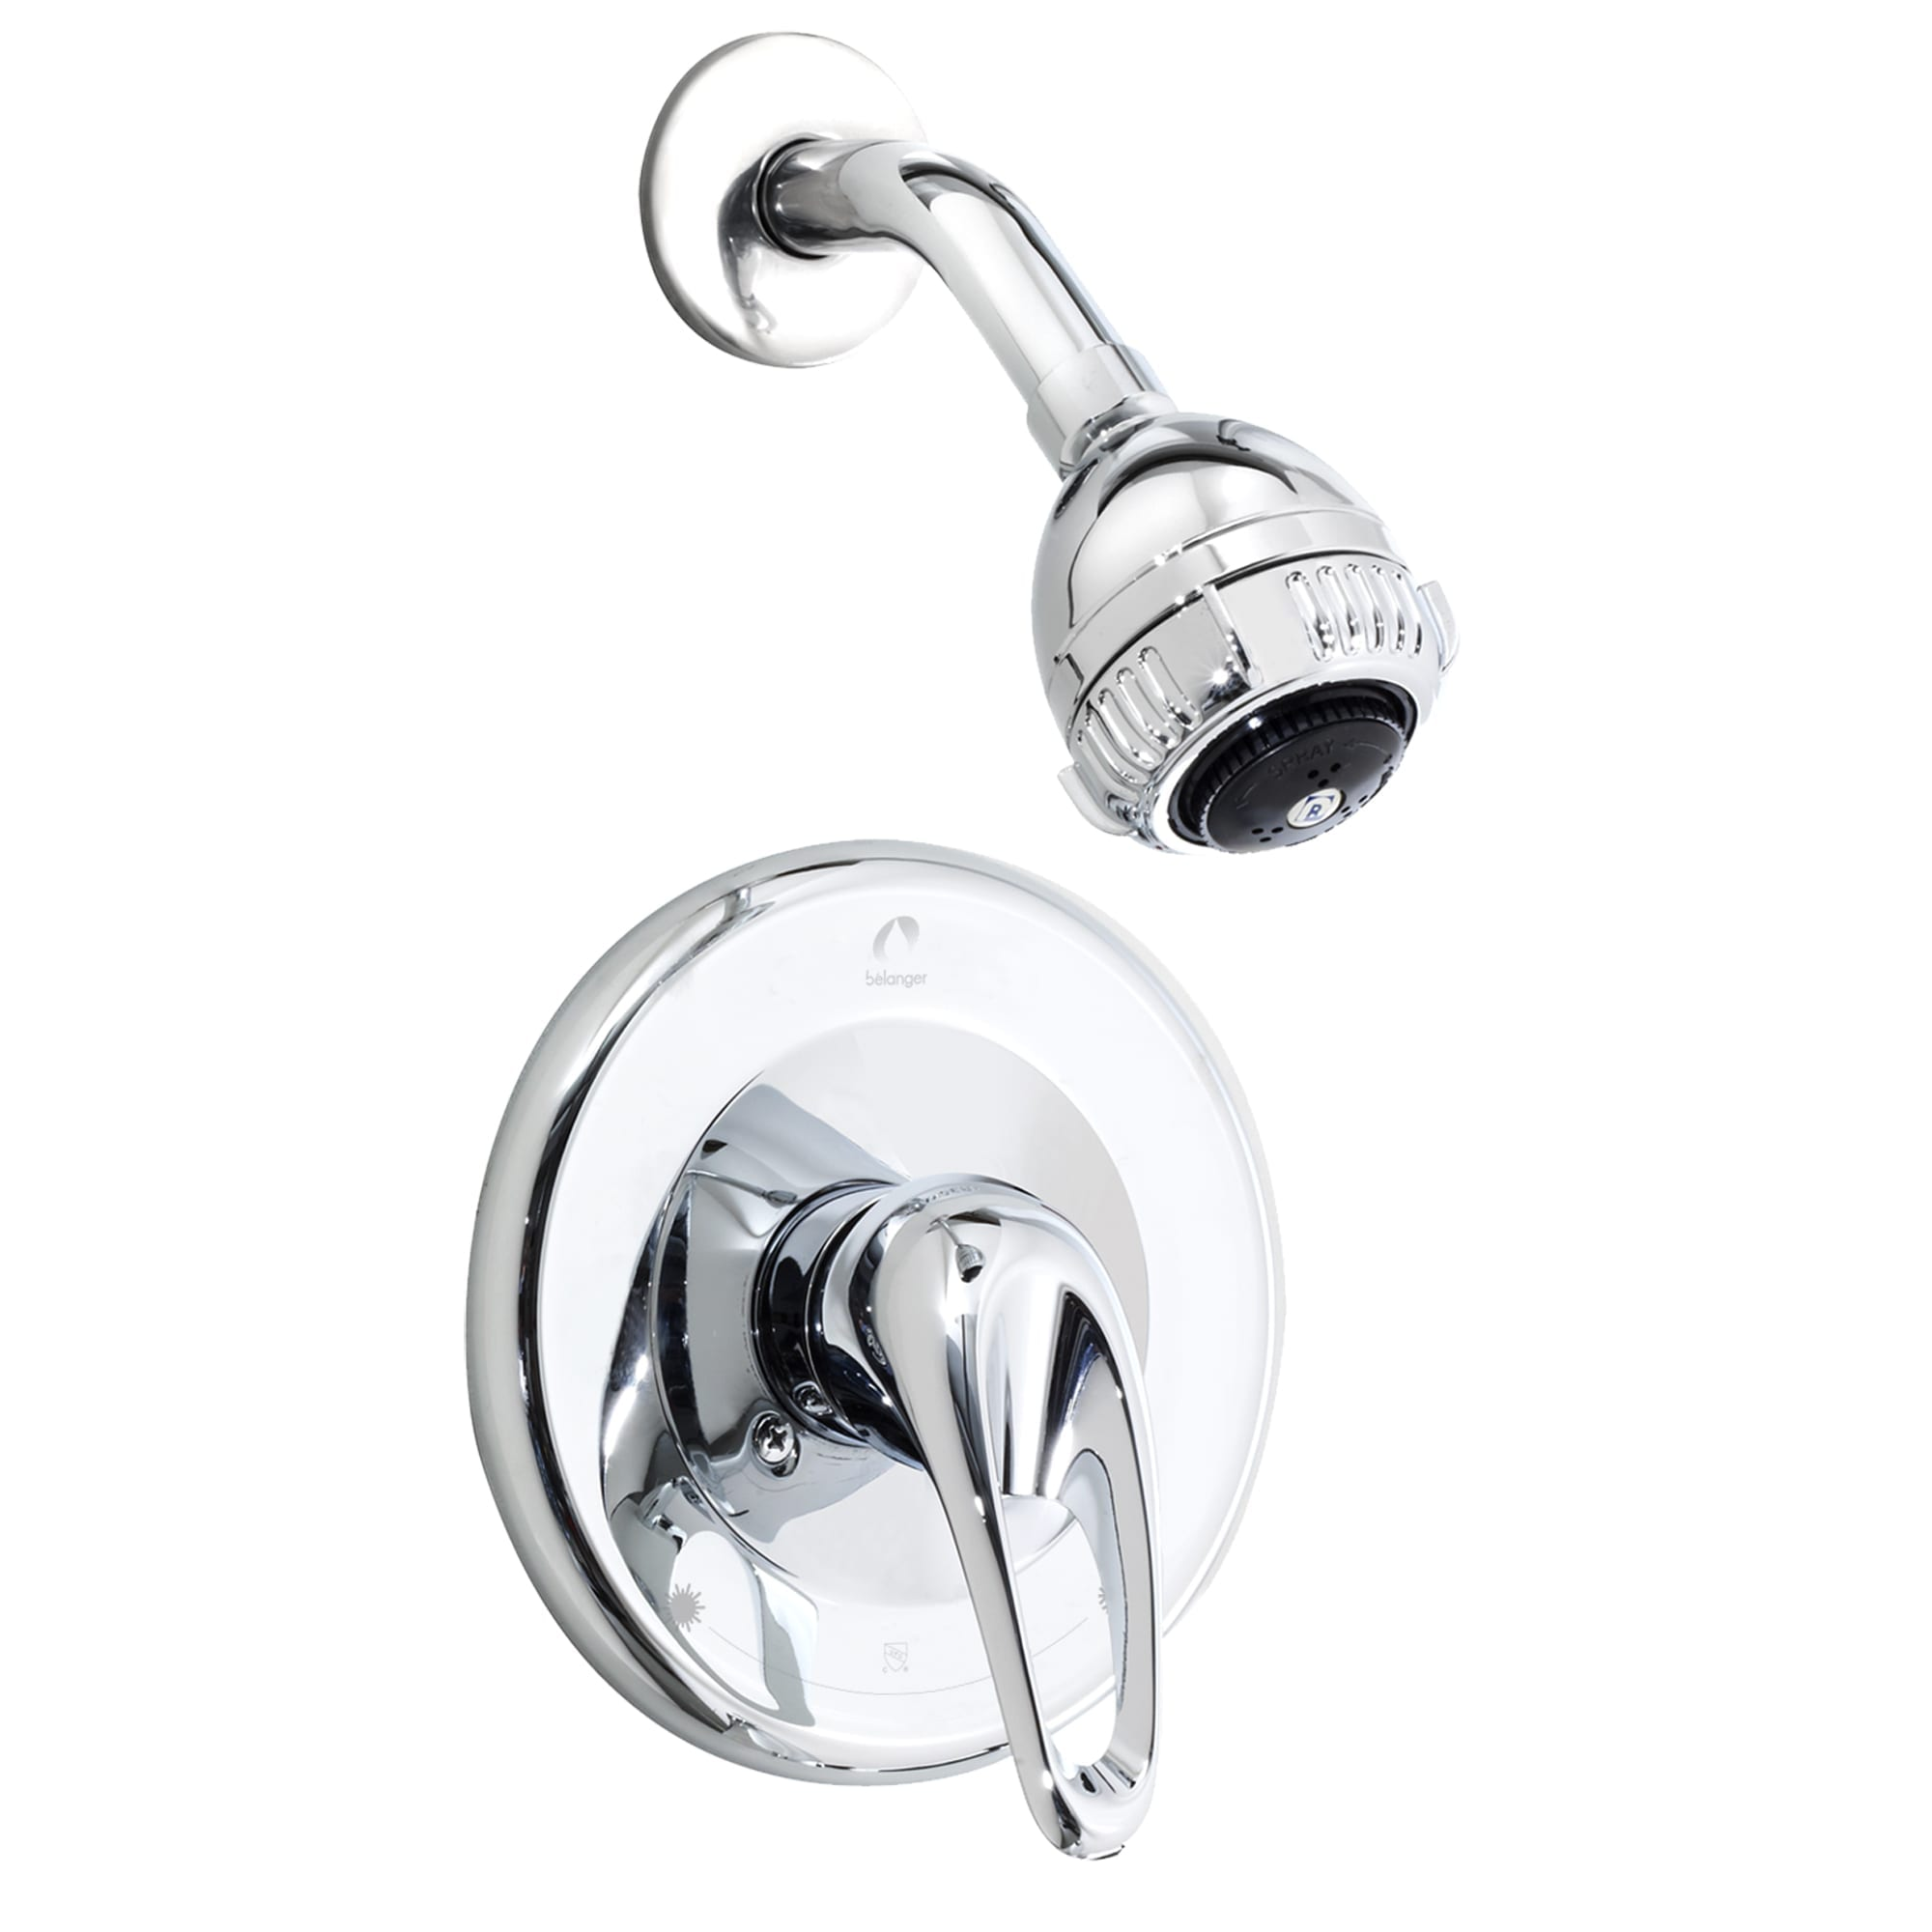 Shower Faucet Trim For Pressure Balanced Valve And Volume Control